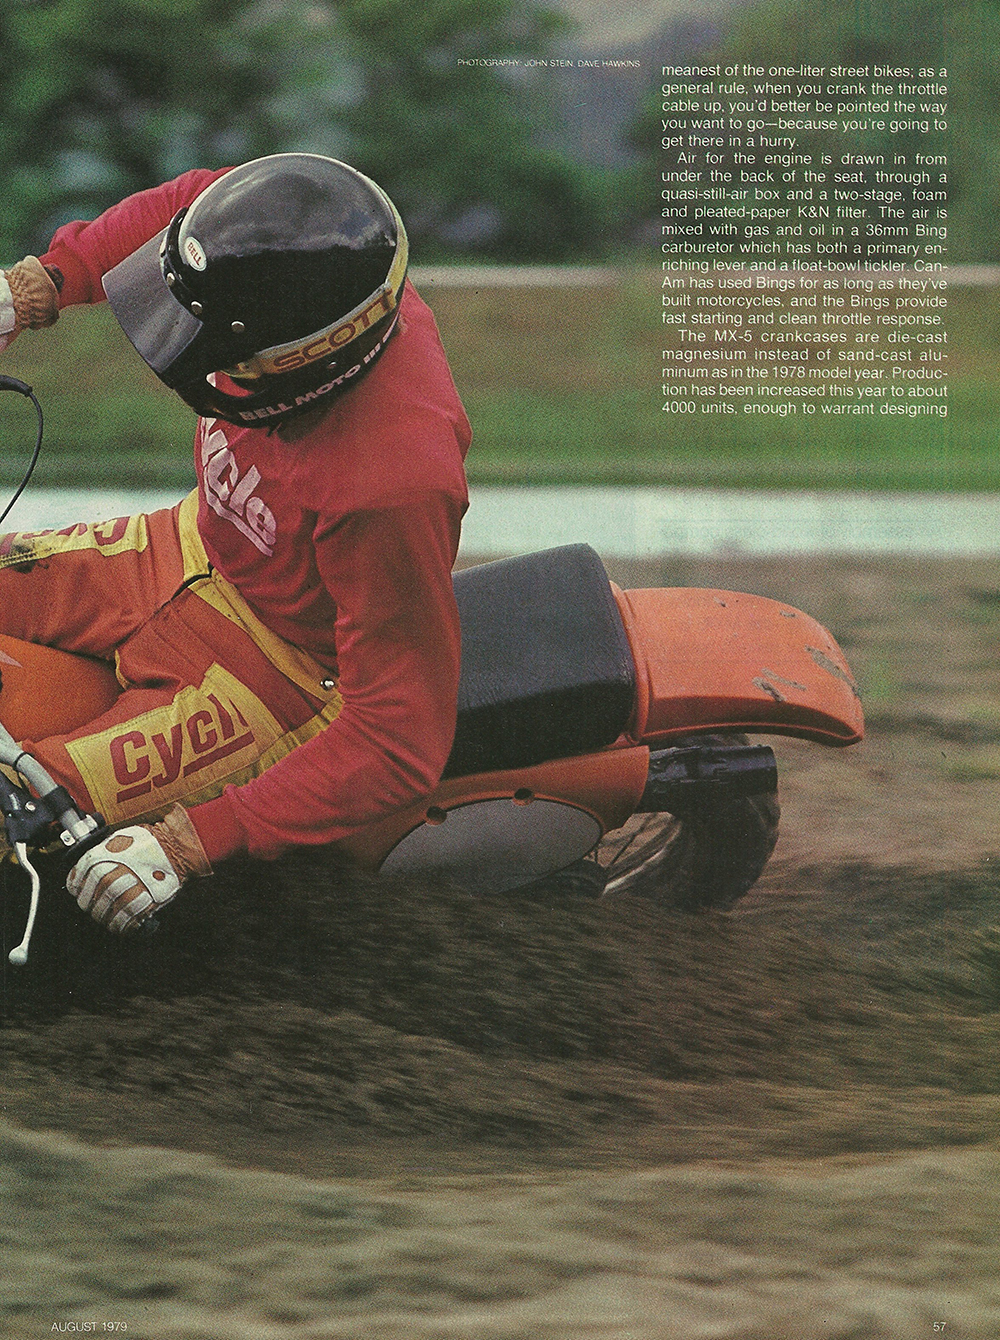 1979 Can Am 370 MX-5 road test 2.JPG